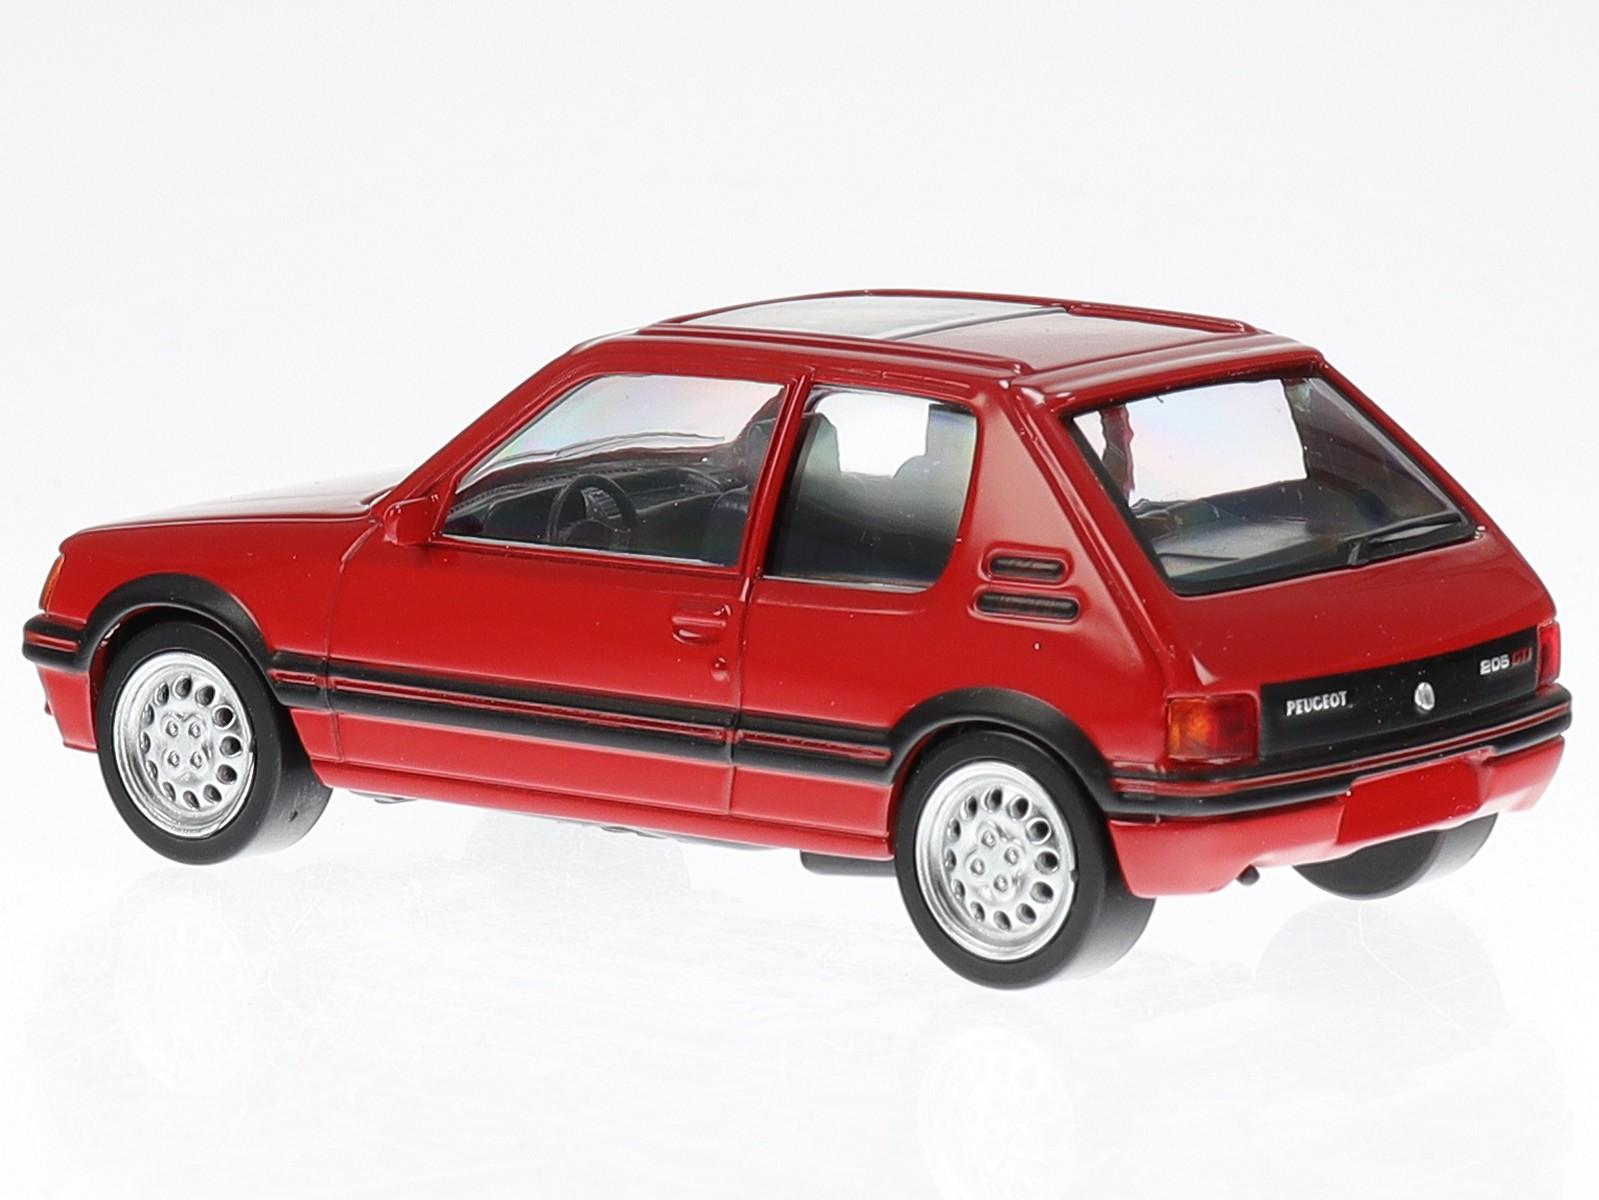 Echelle 1//43 NO 471713 Vallelunga Red Jet-Car NOREV Peugeot 205 GTi 1986